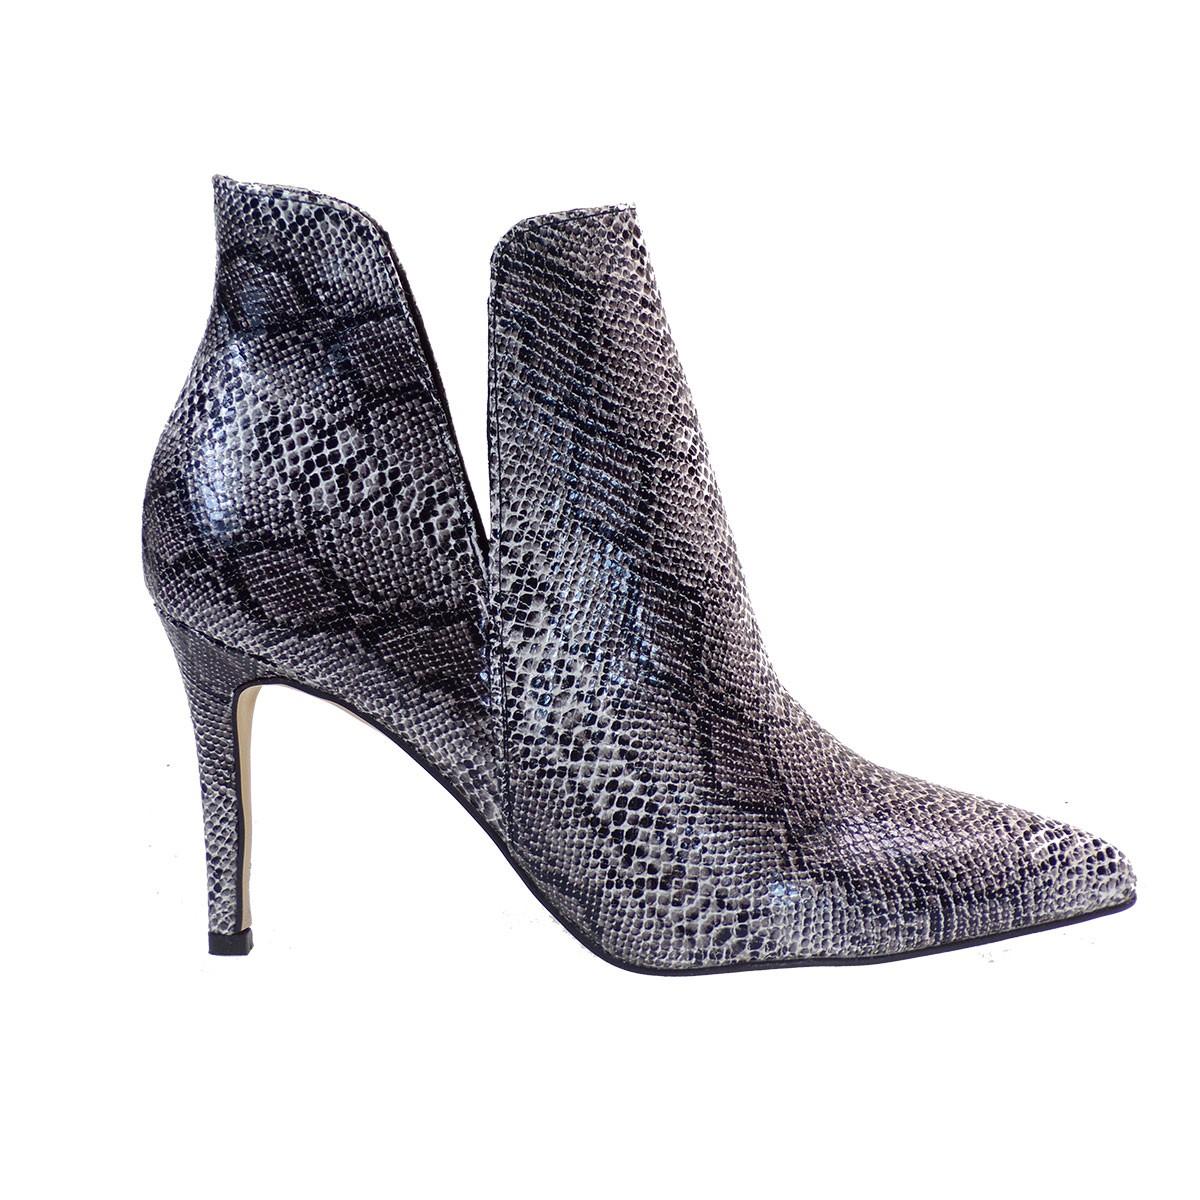 Alessandra Paggioti Γυναικεία Παπούτσια Μποτάκια 81640 Άσπρο-Μαύρο Φίδι